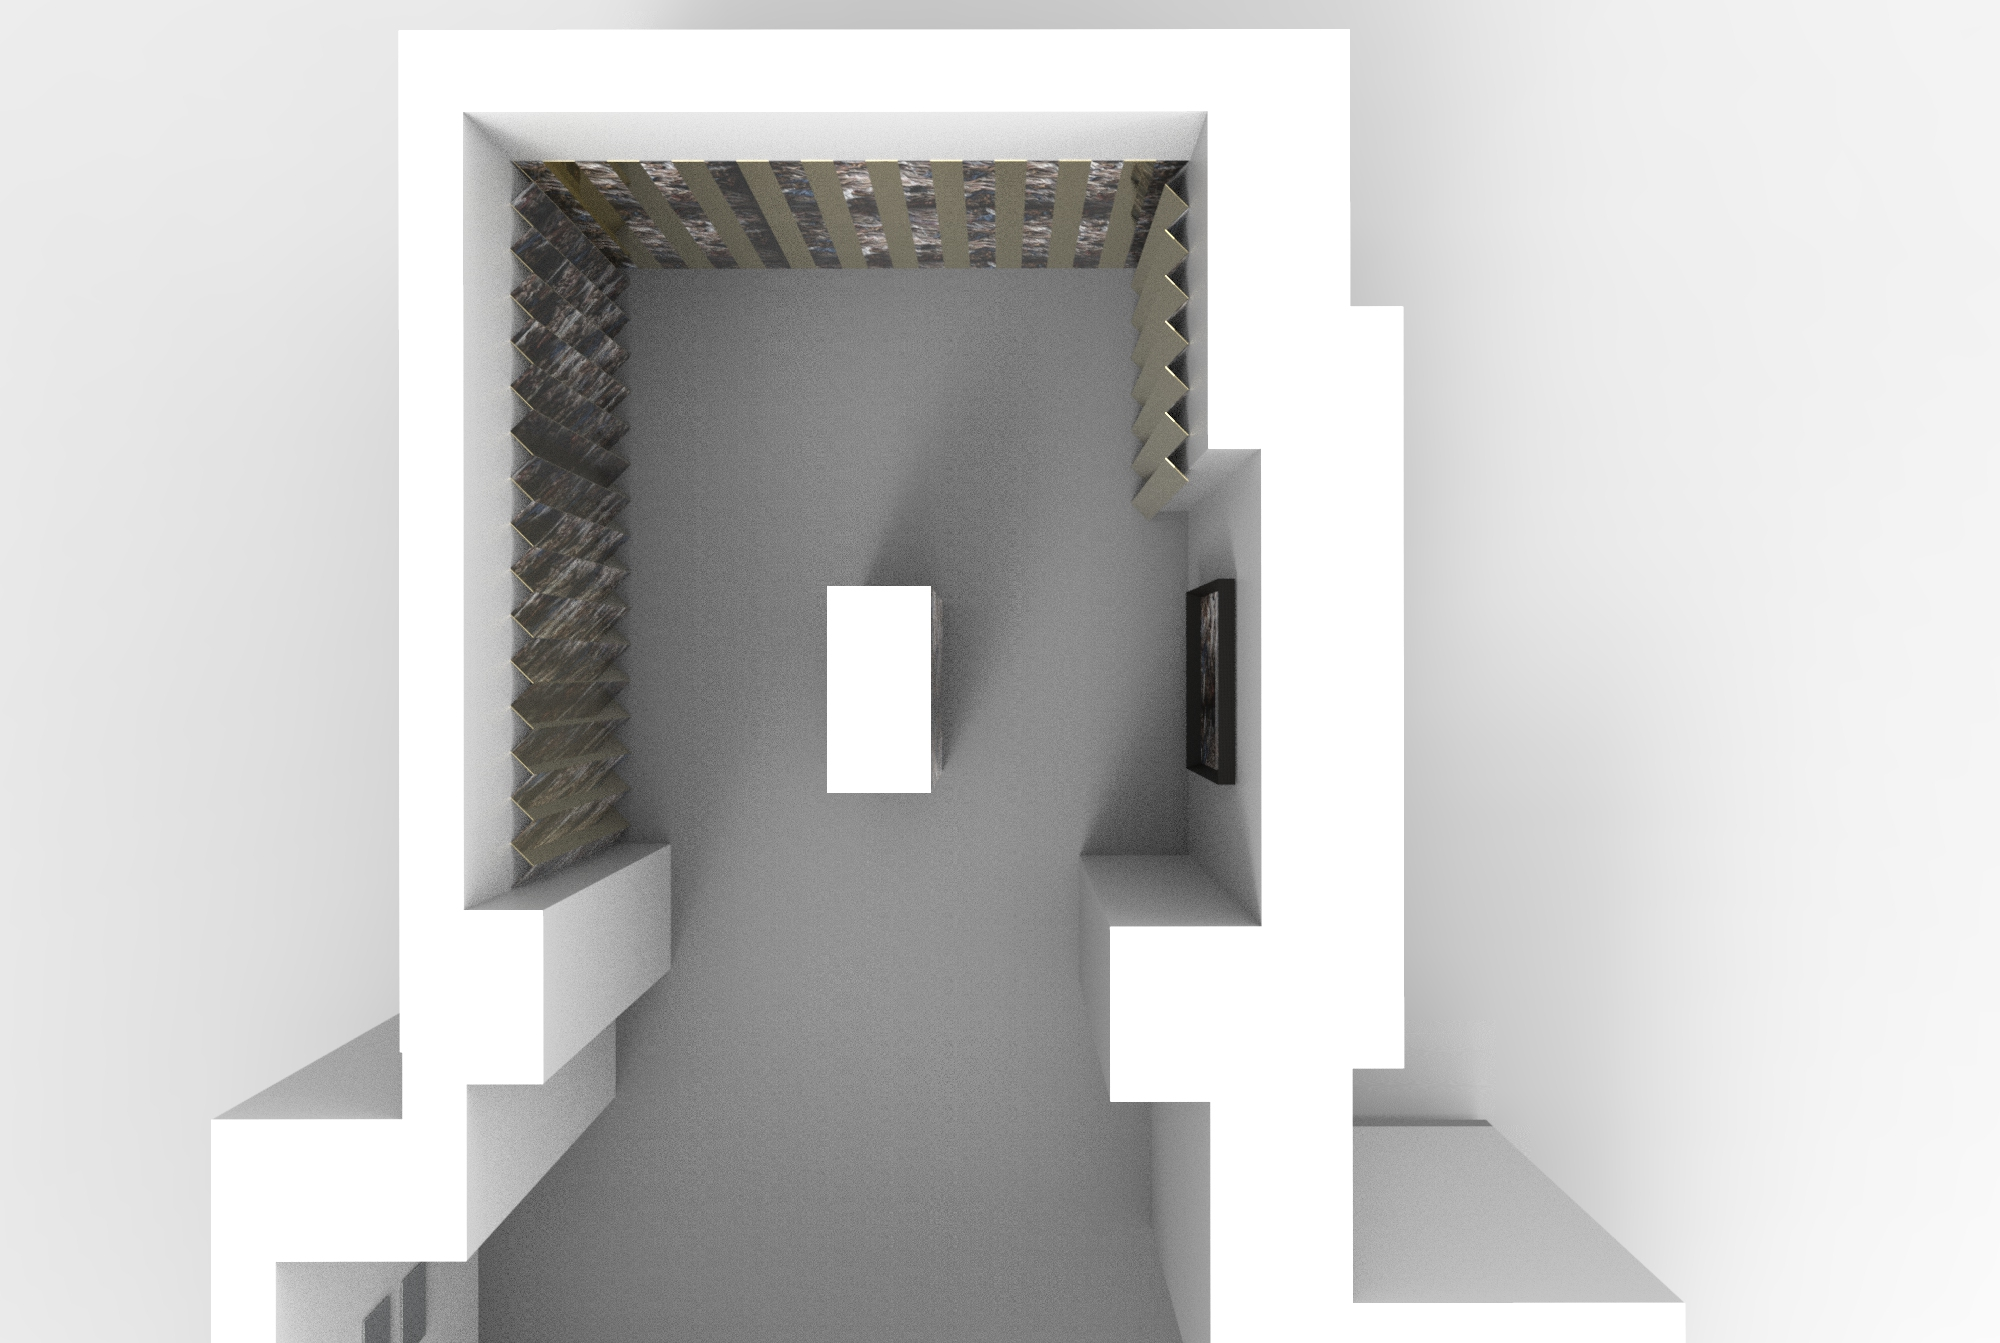 Matteo Mauro - My First Hall of Mirrors - Render (1)